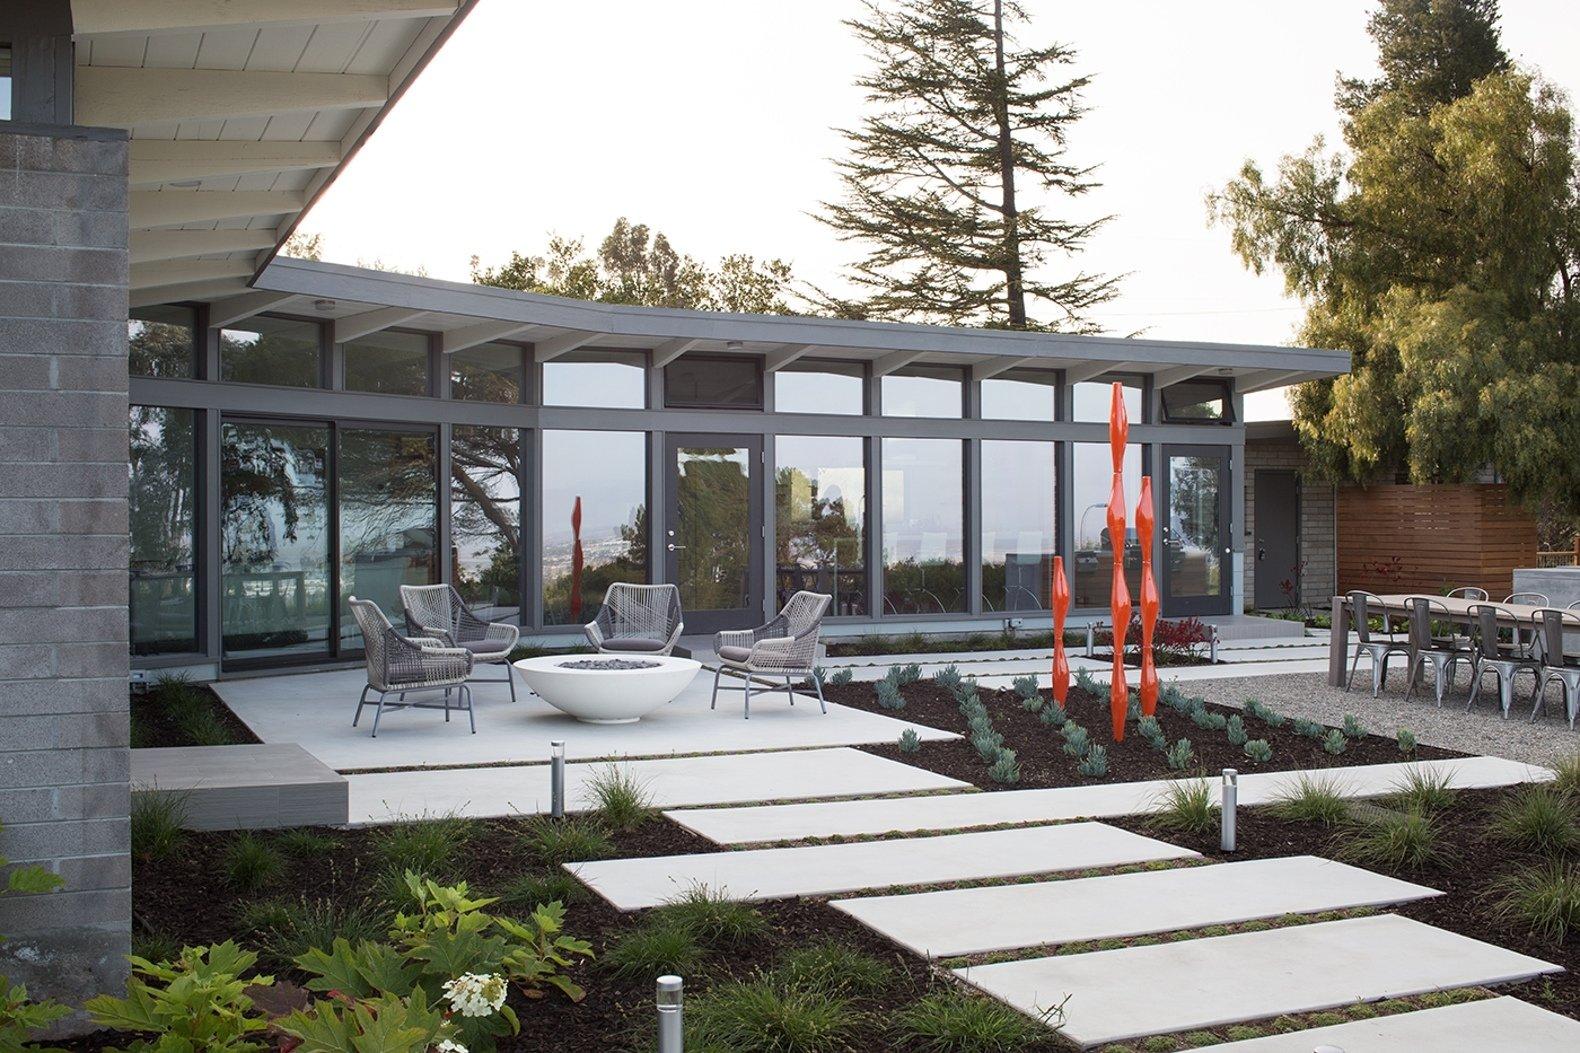 10 Nice Mid Century Modern Landscape Design Ideas mid century modern landscape design ideas internetunblock 2021